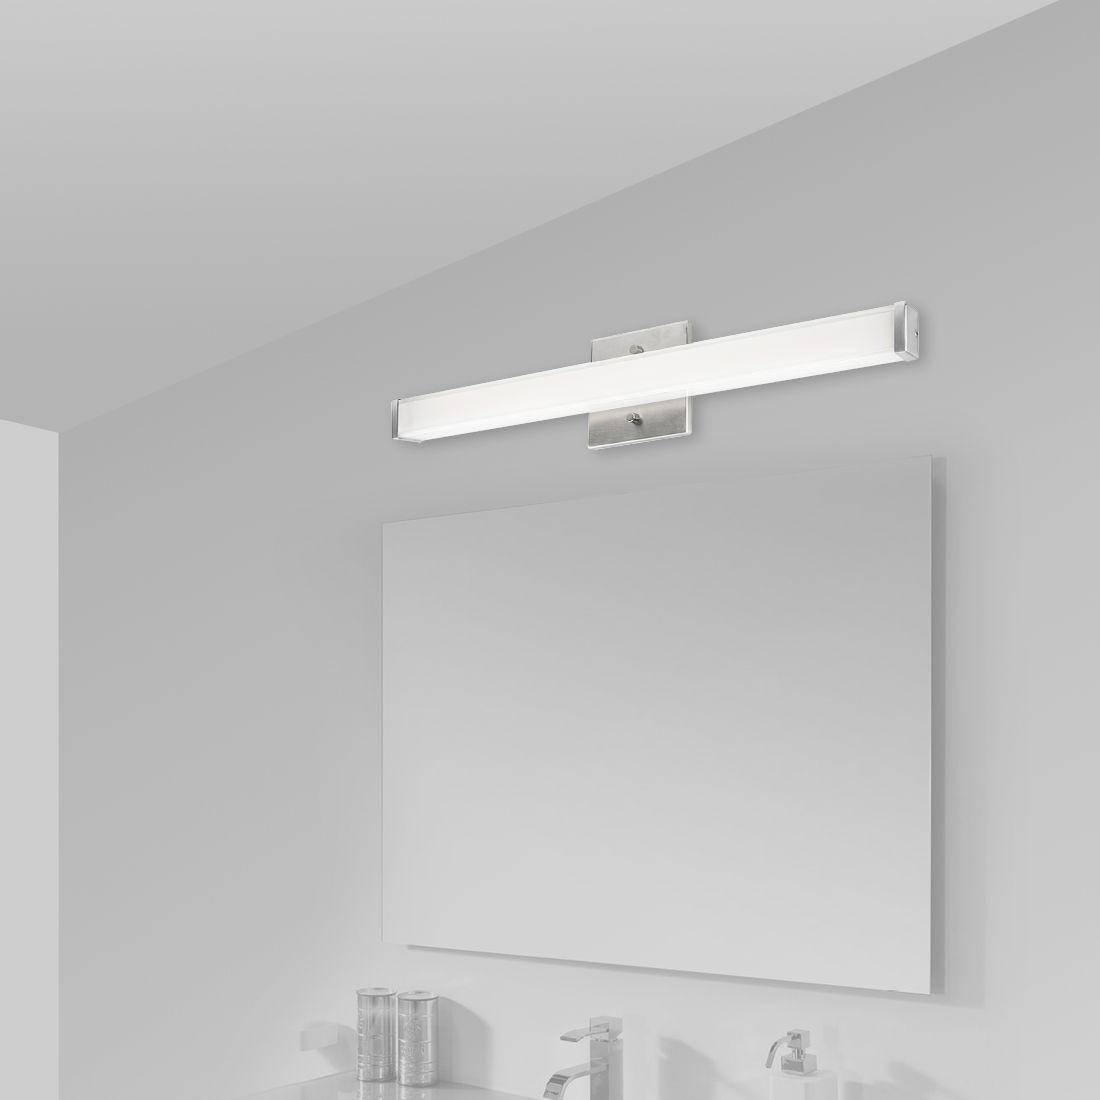 Alcon Lighting 11118 Vanity Led Linear Wall Mount Lighting Fixture Alconlighting Com